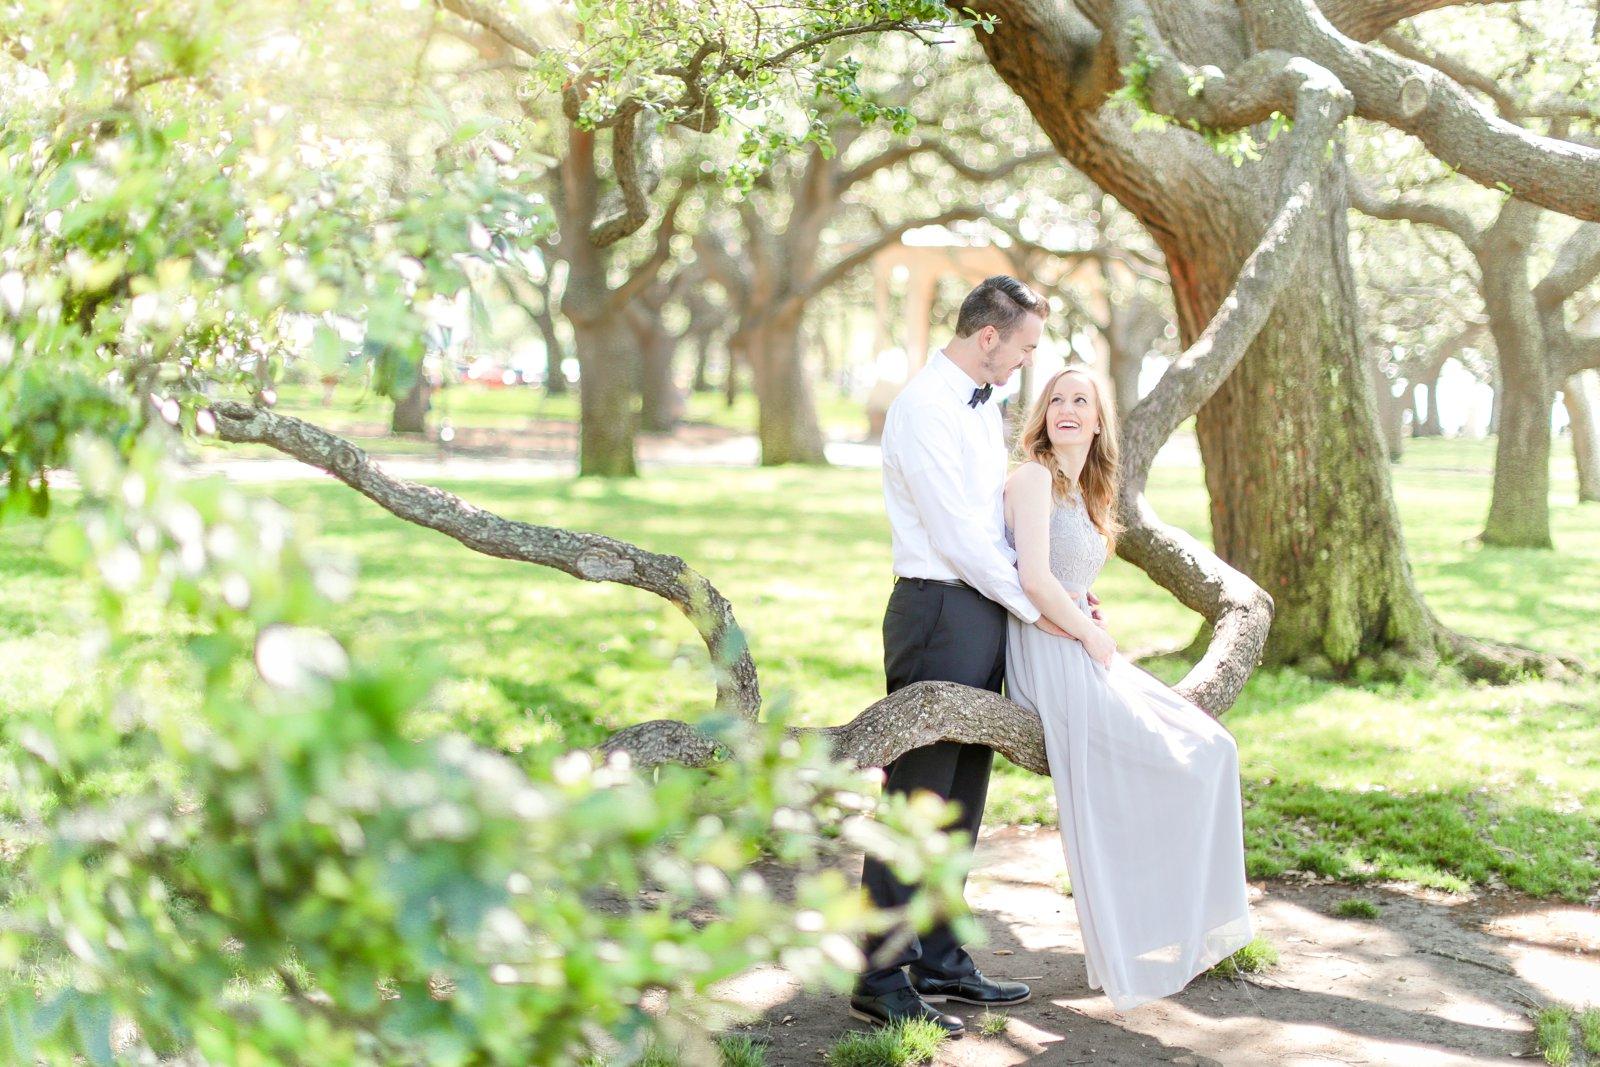 wedding_photographer_Missouri_Destination_elope_intimate_Saint_James_MO_Missouri_KansasCity_Jeff_City_Jefferson_Columbia_Engagement_Photos_Pictures_Session_Best_Videographer_0288.jpg